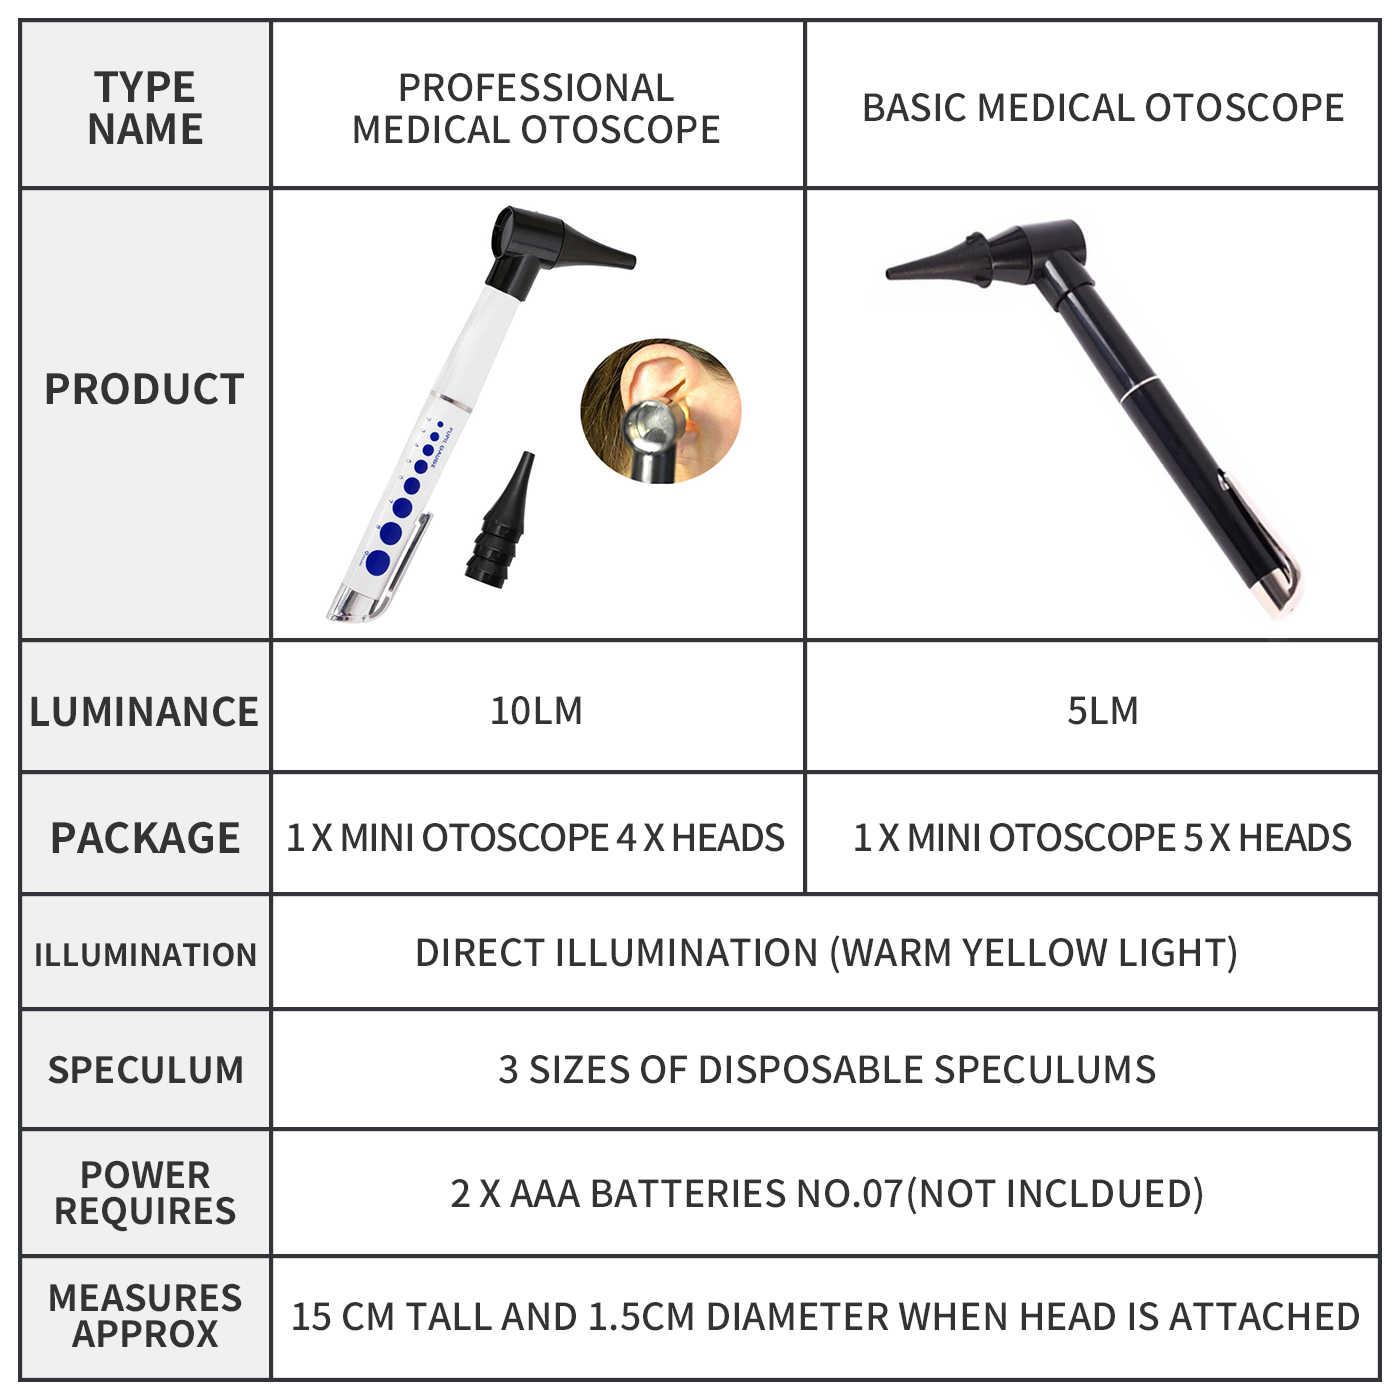 Medis Otoscope Telinga Medis Otoscope Pena Lampu Medis Telinga Kaca Pembesar Telinga Cleaner Set Klinis Medis Diagnostik Set